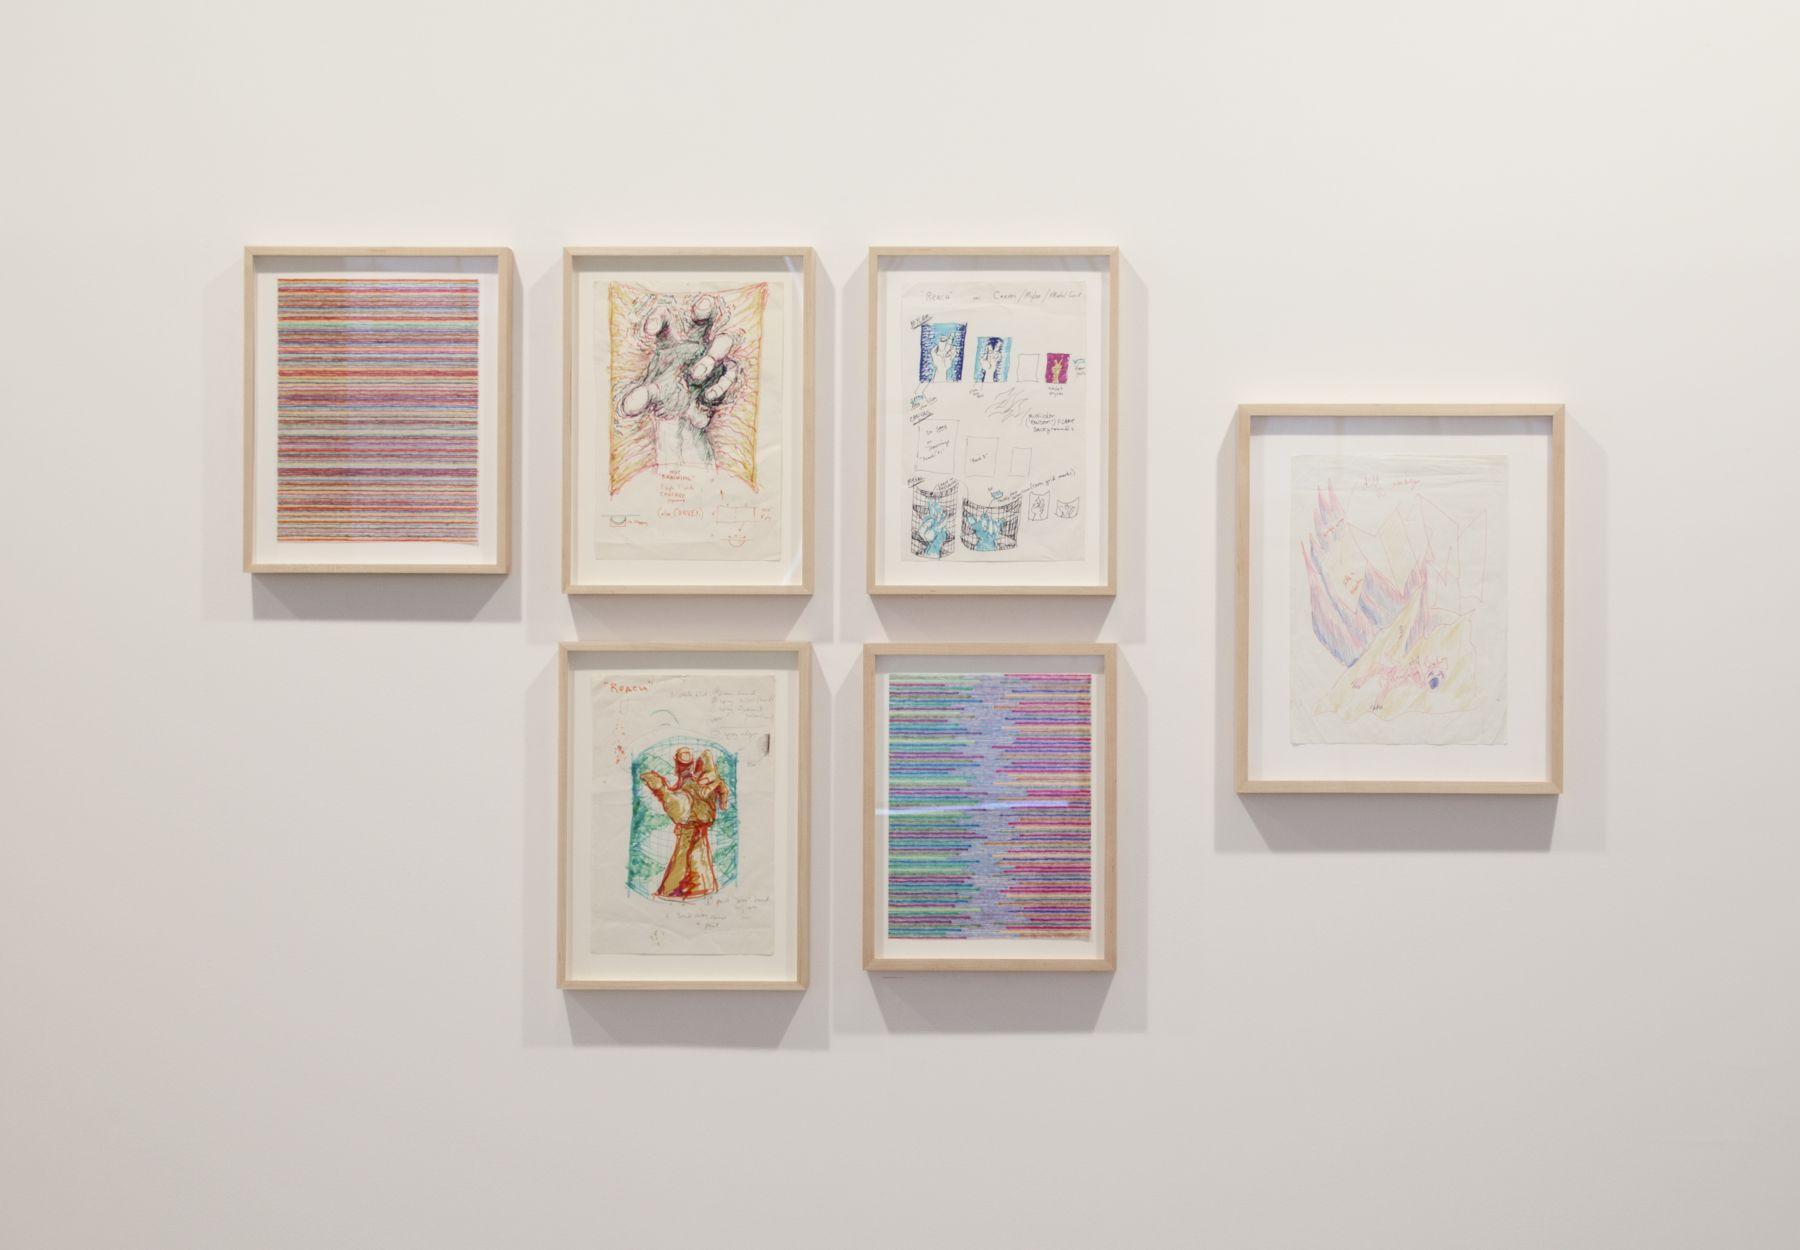 Paul Sharits, Installation view, Greene Naftali, New York, 2011